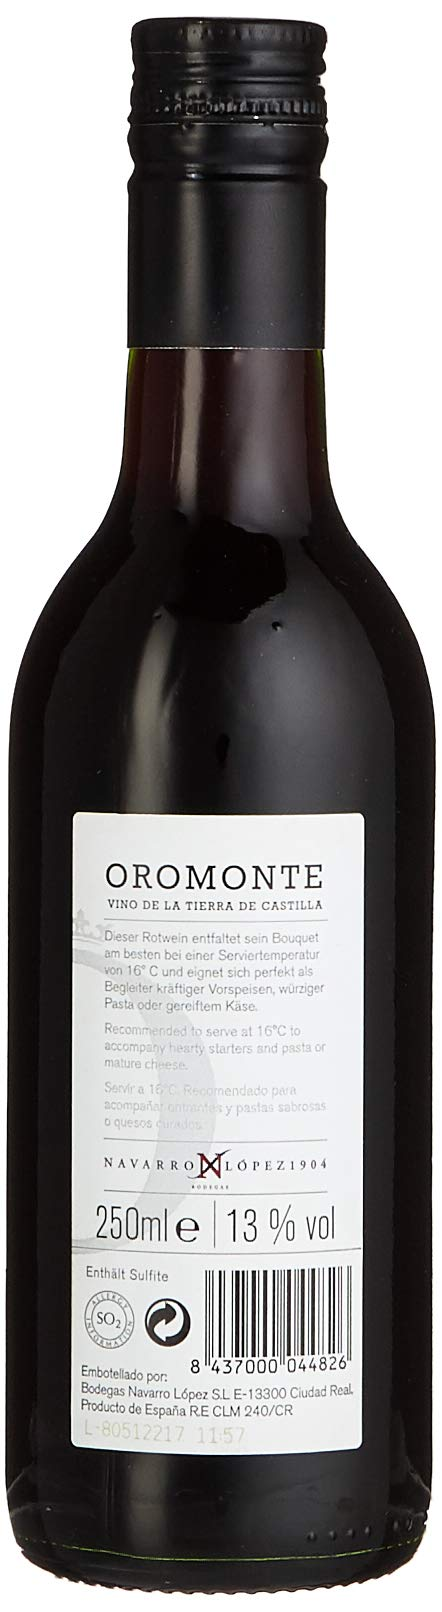 Navarro-Lopez-Oromonte-Tempranillo-VdT-de-Castilla-trocken-025-L-3er-Pack-3-x-250-ml